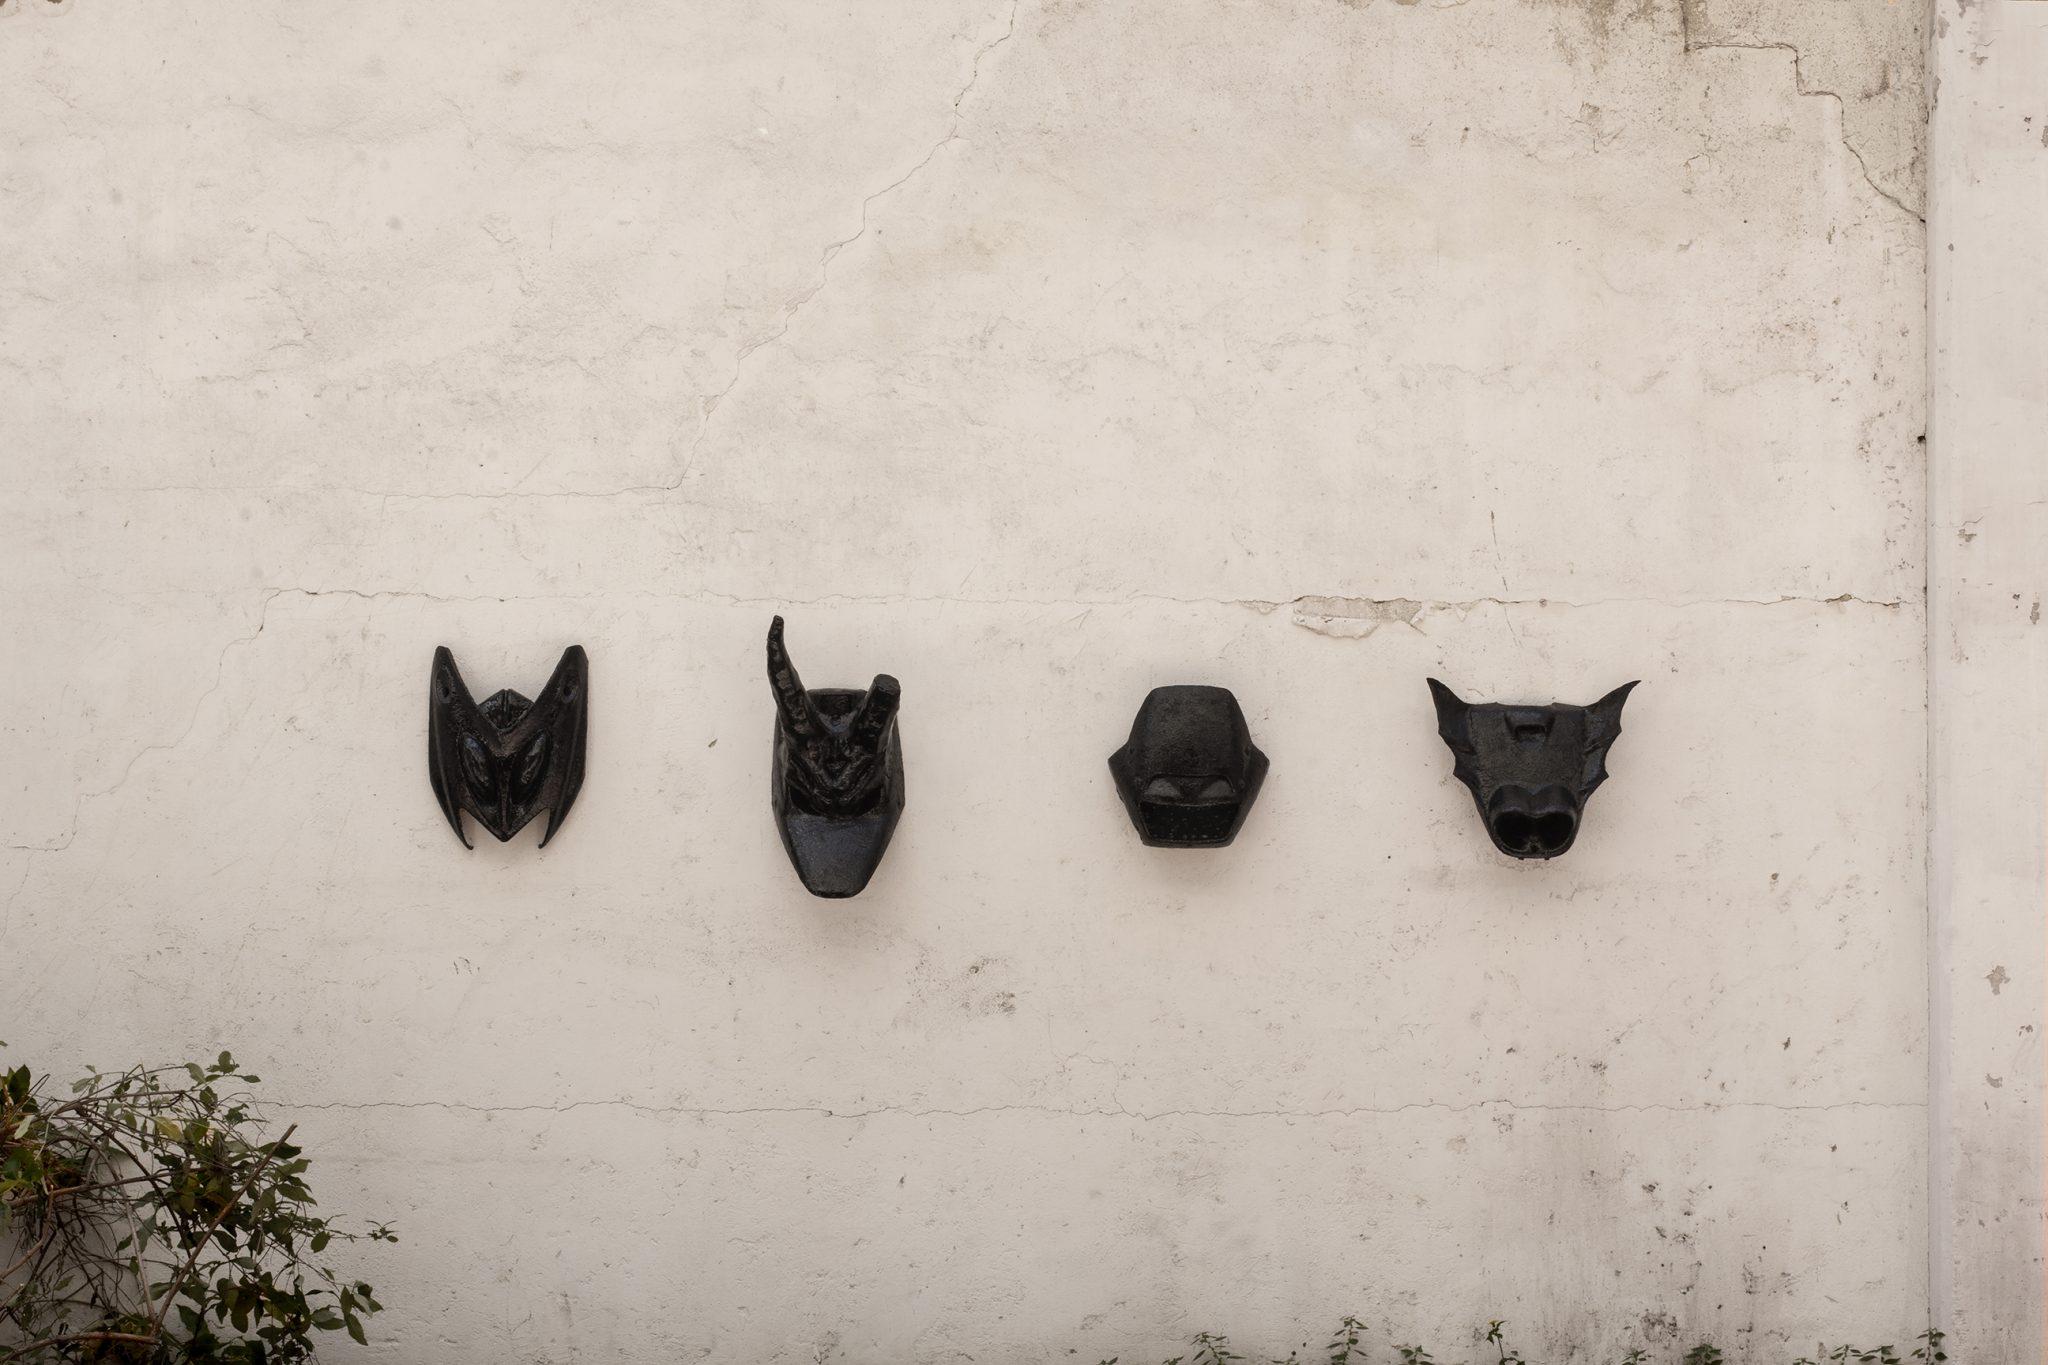 NITRO, SPIRIT, PEGASO, ROCKET (2019) intervento a tecnica mista su carene di scooter, intallation view @ Eptacaidecafobia (Biennolo), Milano Photo credit: Natalia Trejbalova